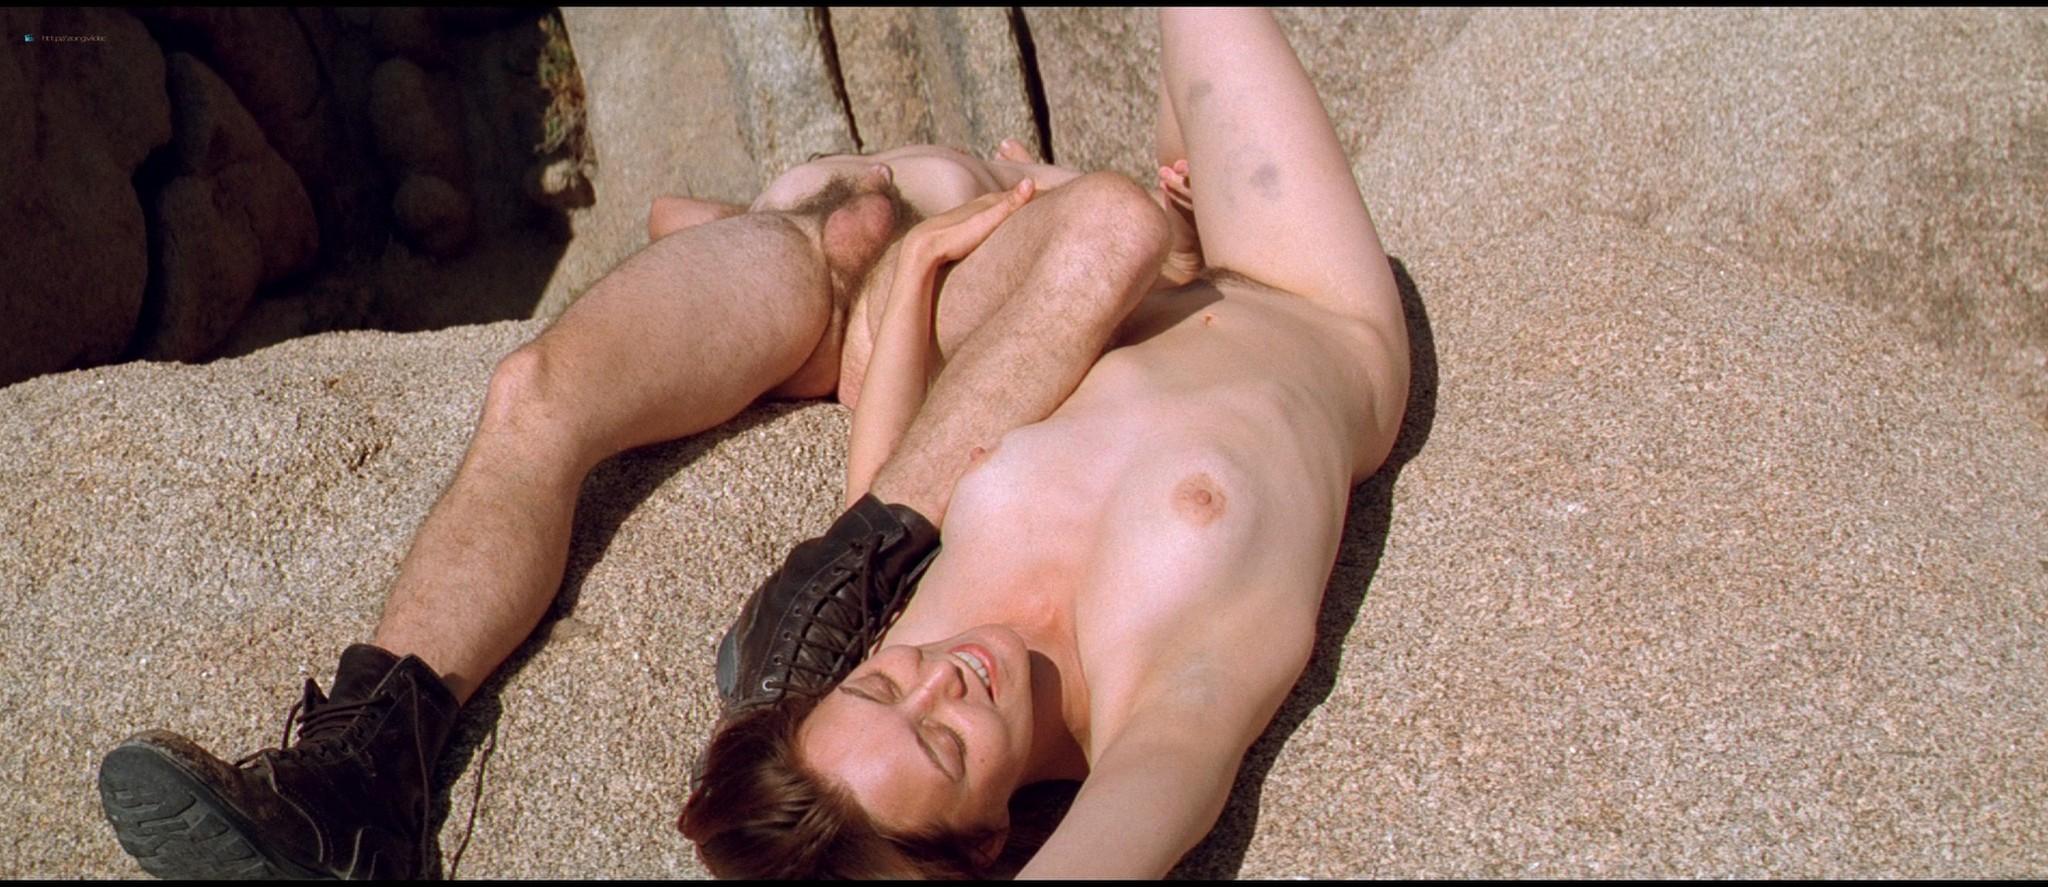 Yekaterina Golubeva nude full frontal explicit sex - Twentynine Palms (2003) HD 1080p BluRay REMUX (13)